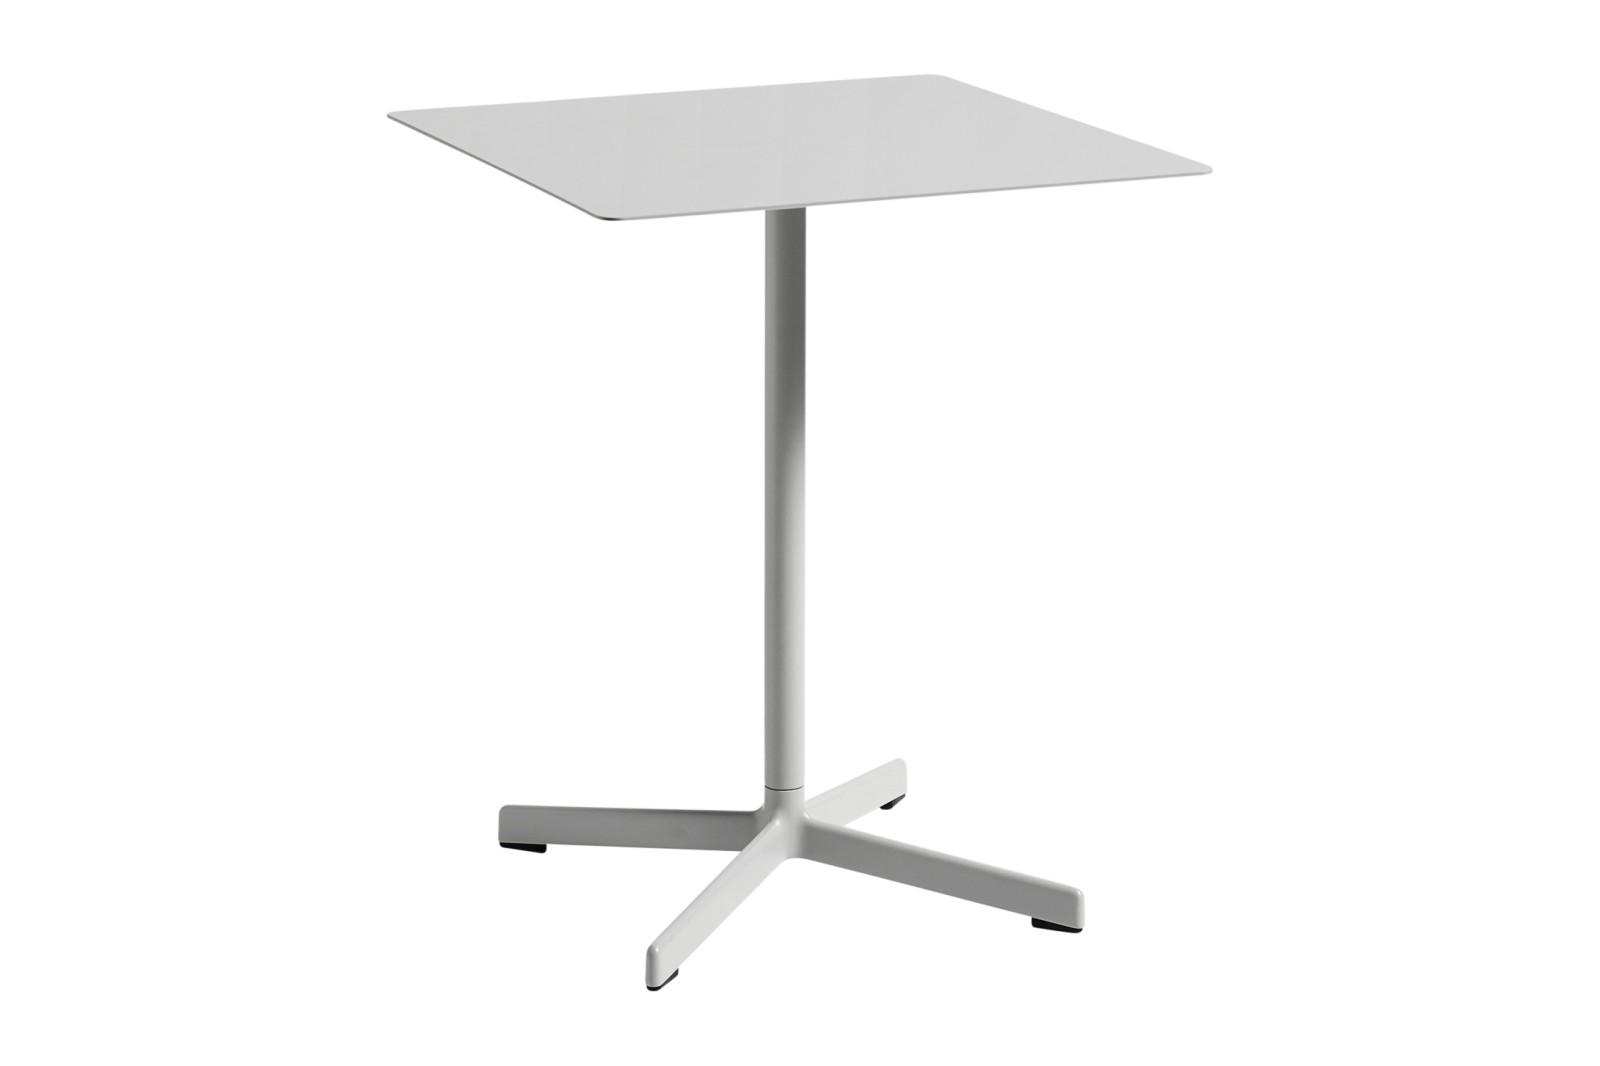 Neu Square Outdoor Table Light Grey